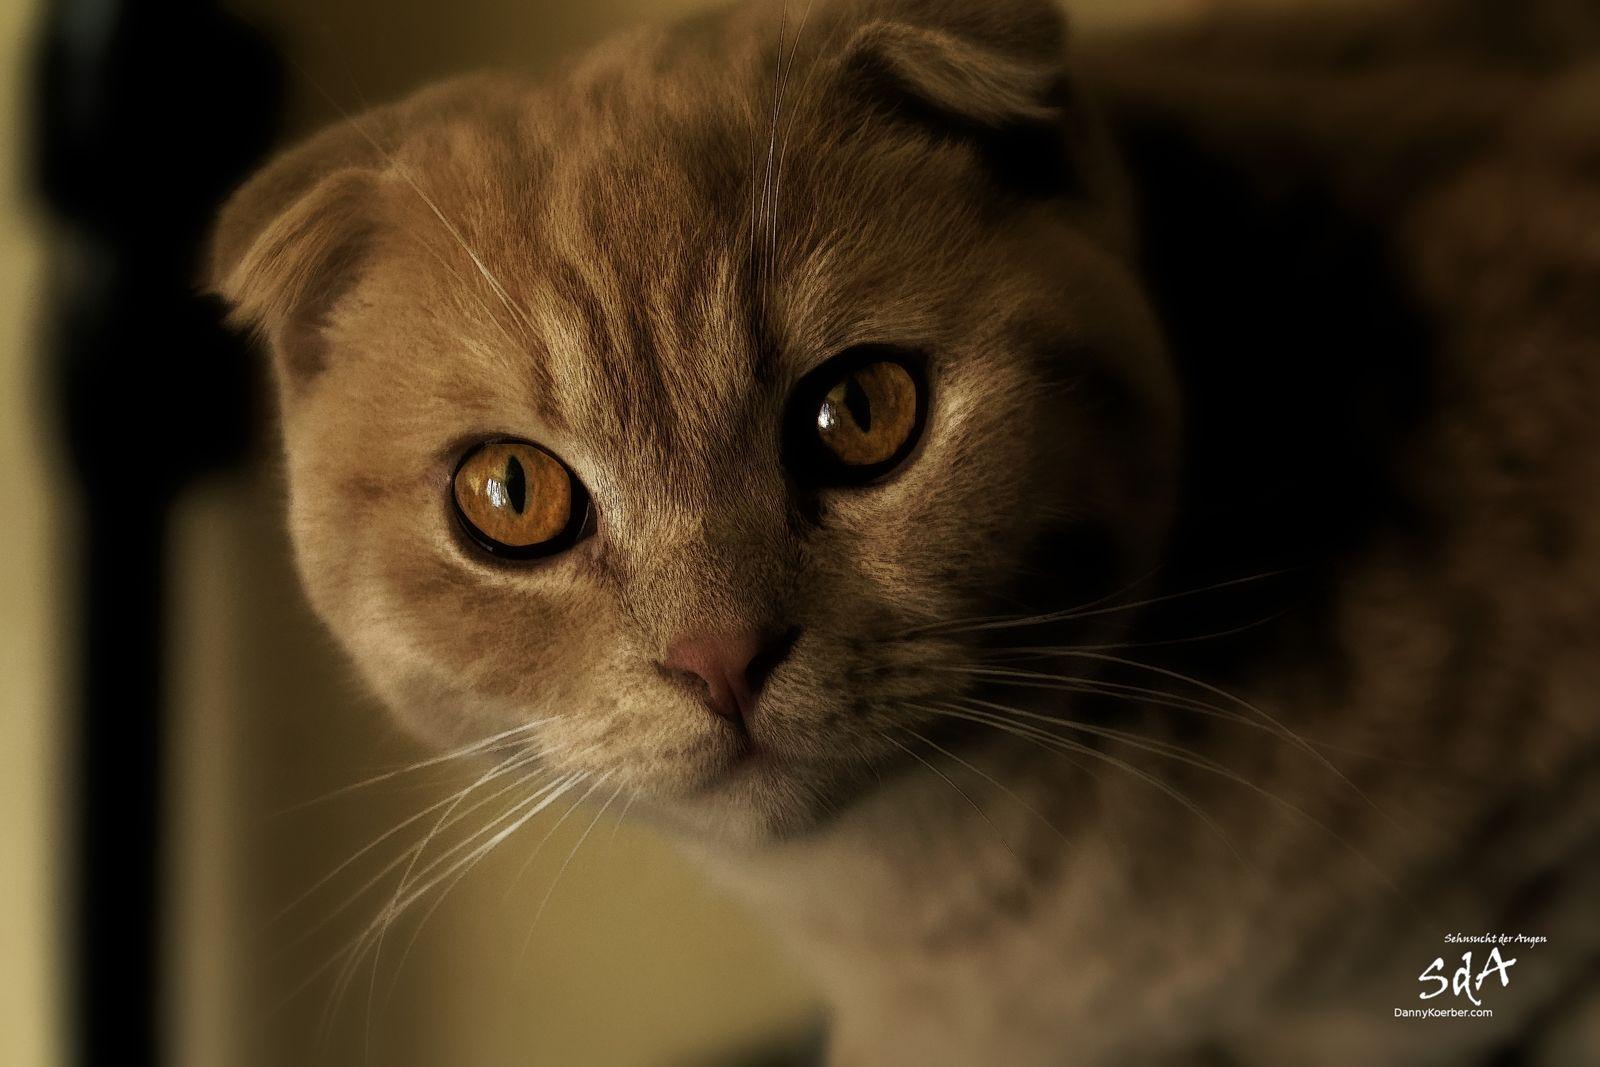 Der goldene Blick, Scotisch Fold fotografiert von Danny Koerber.